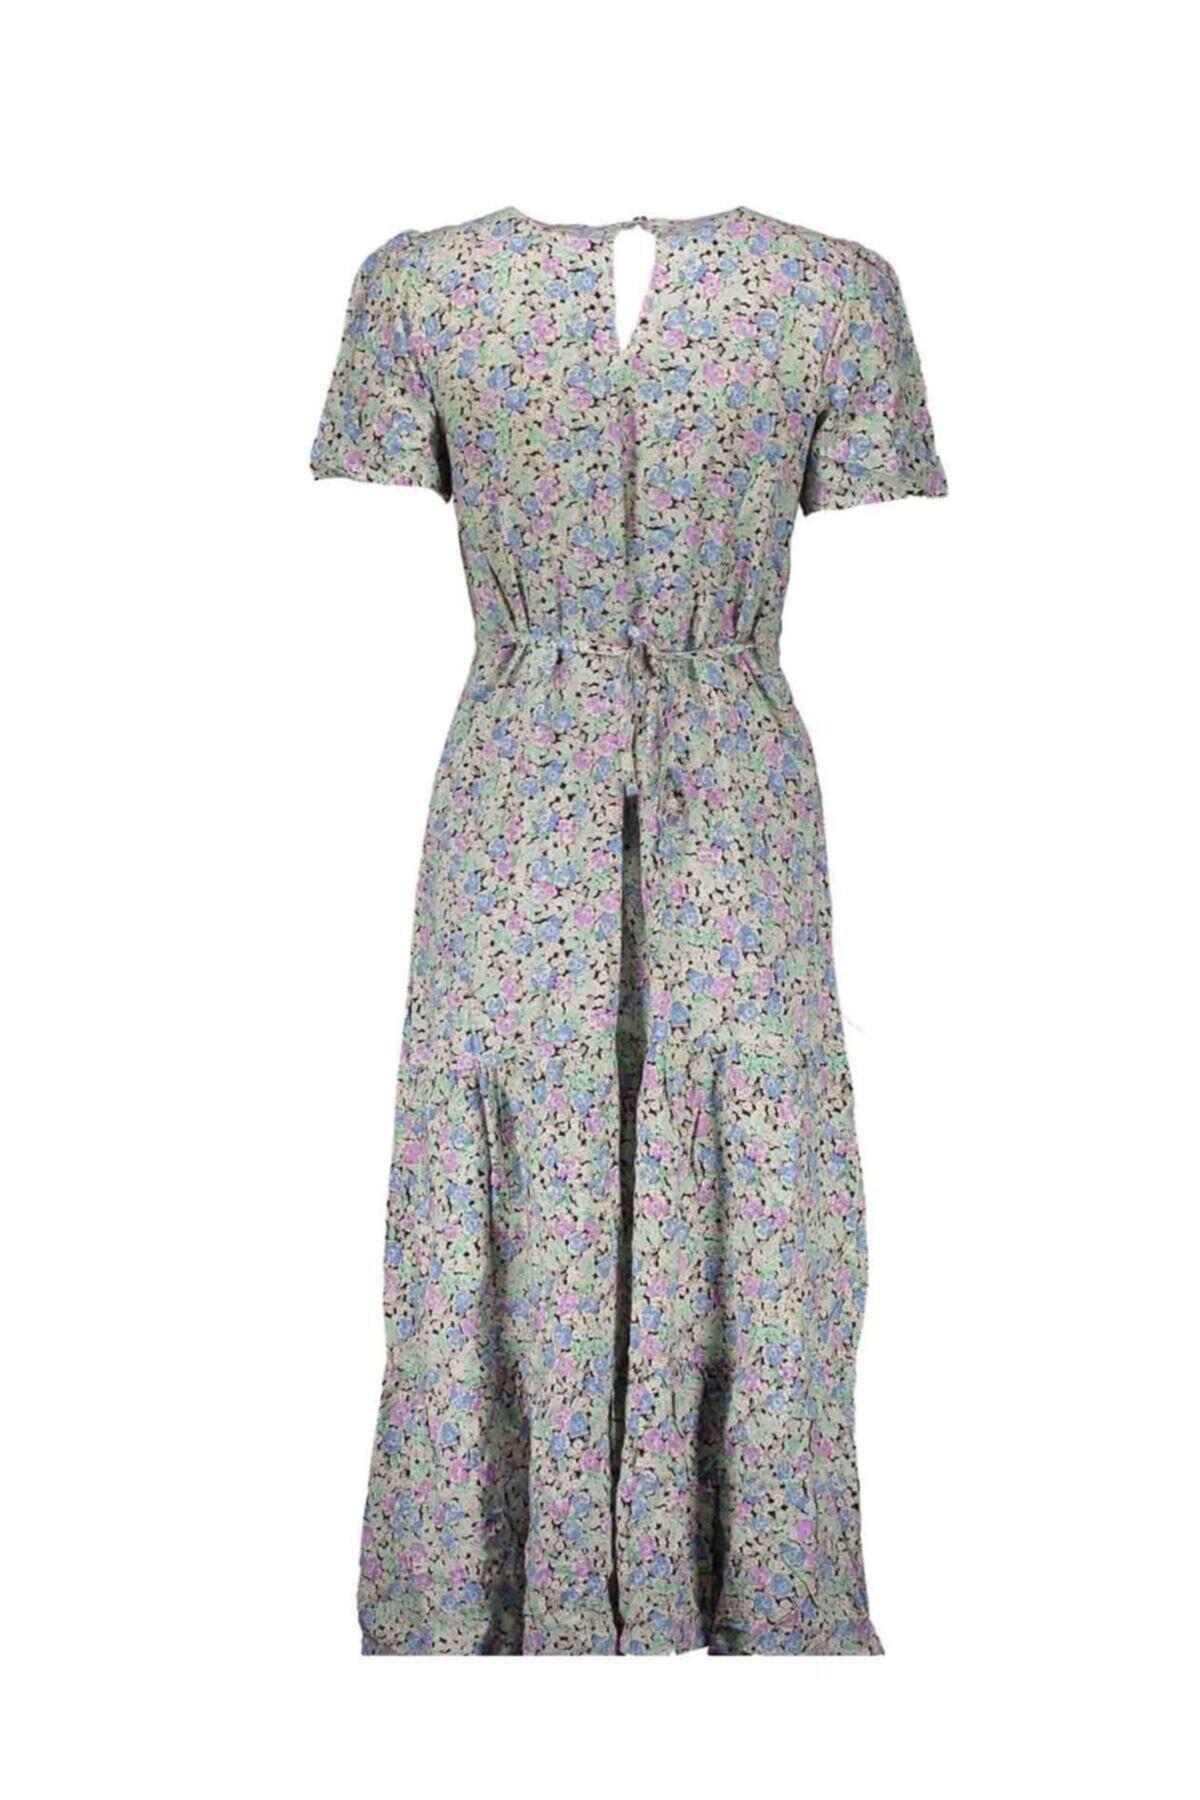 Collezione Lila Kadın Elbise 2